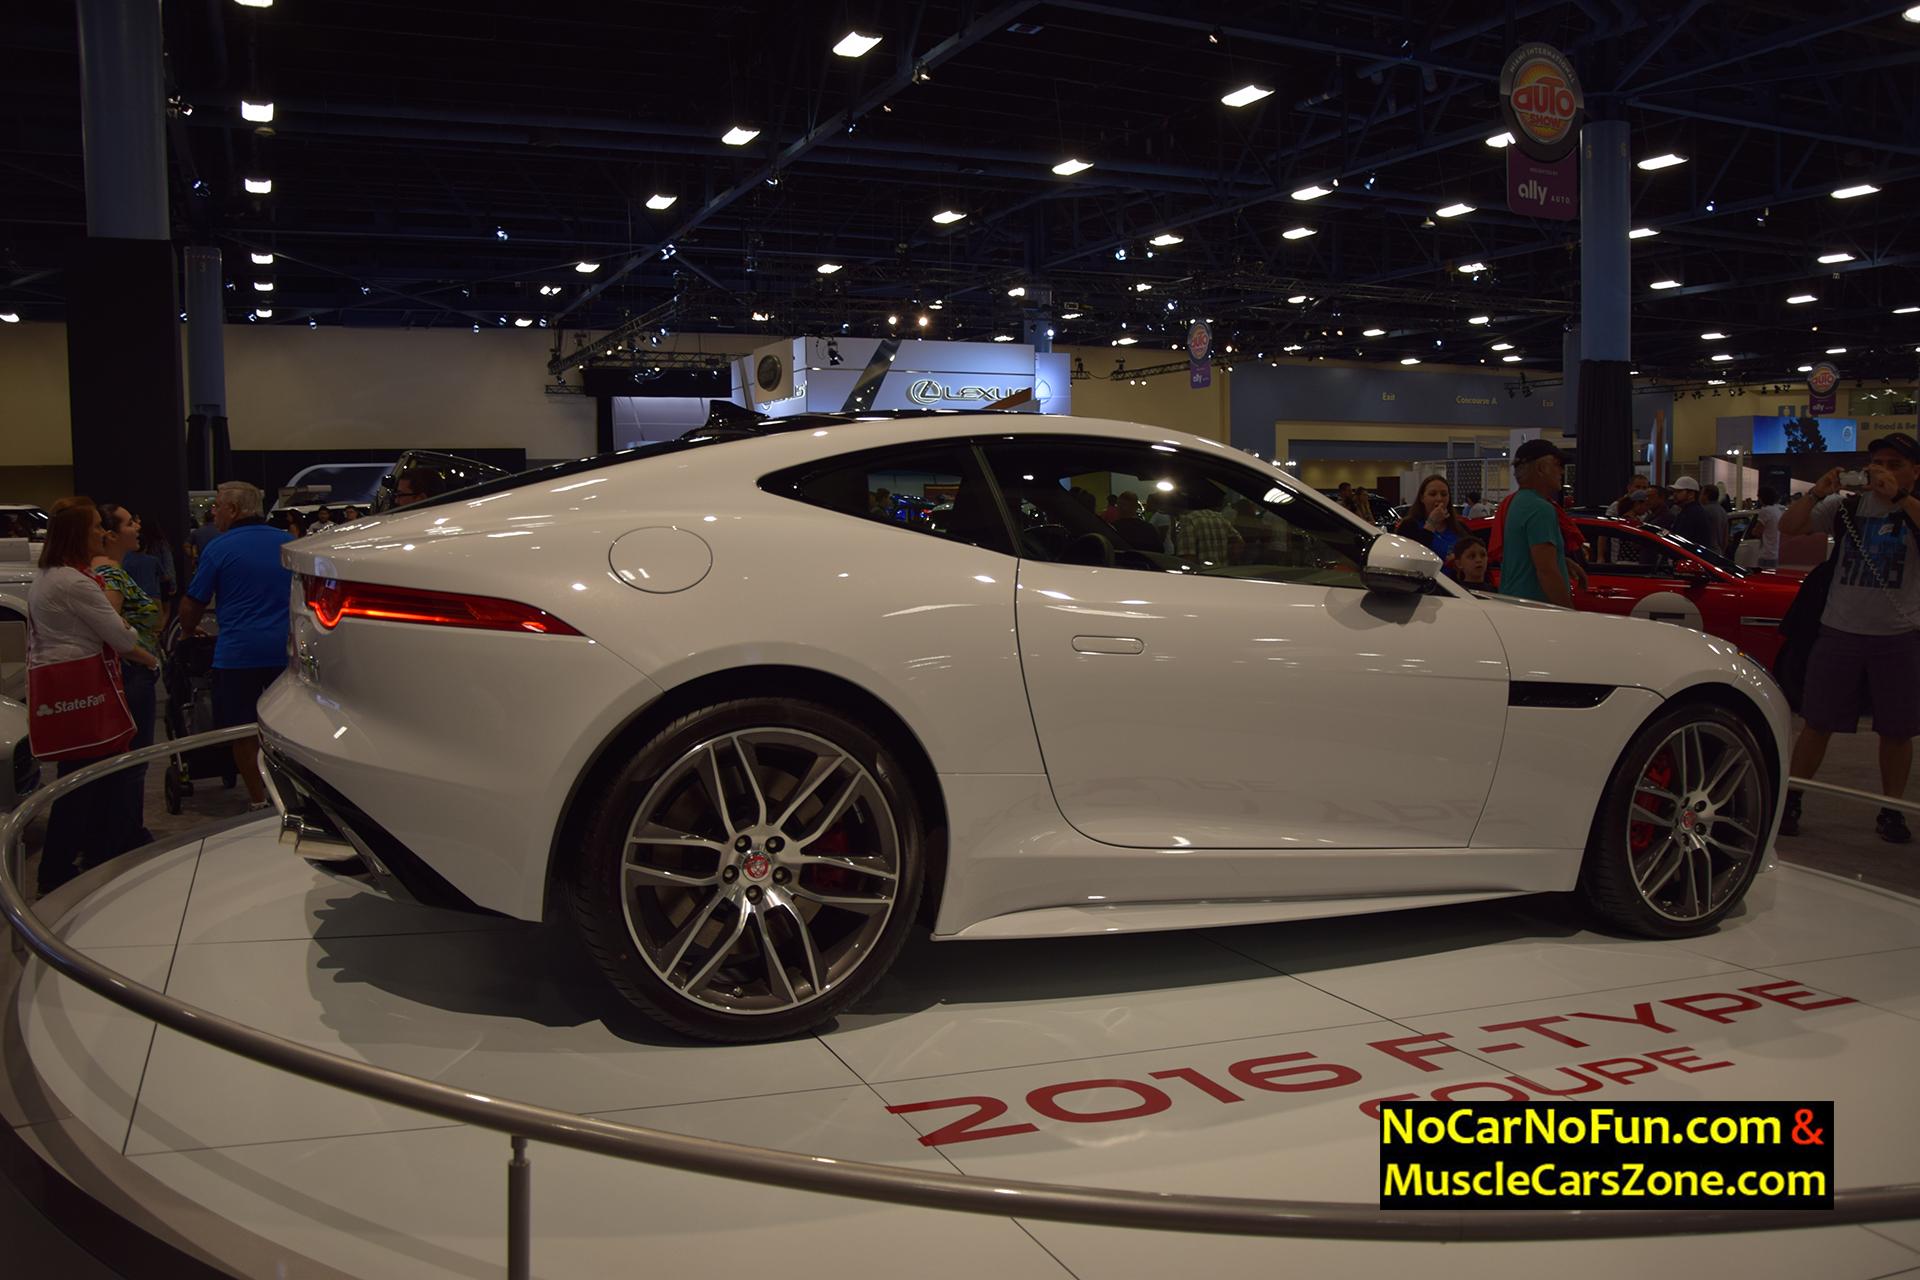 2016 Jaguar F-Type Coupe - Miami Auto Show 2015 1 - Muscle Cars Zone!